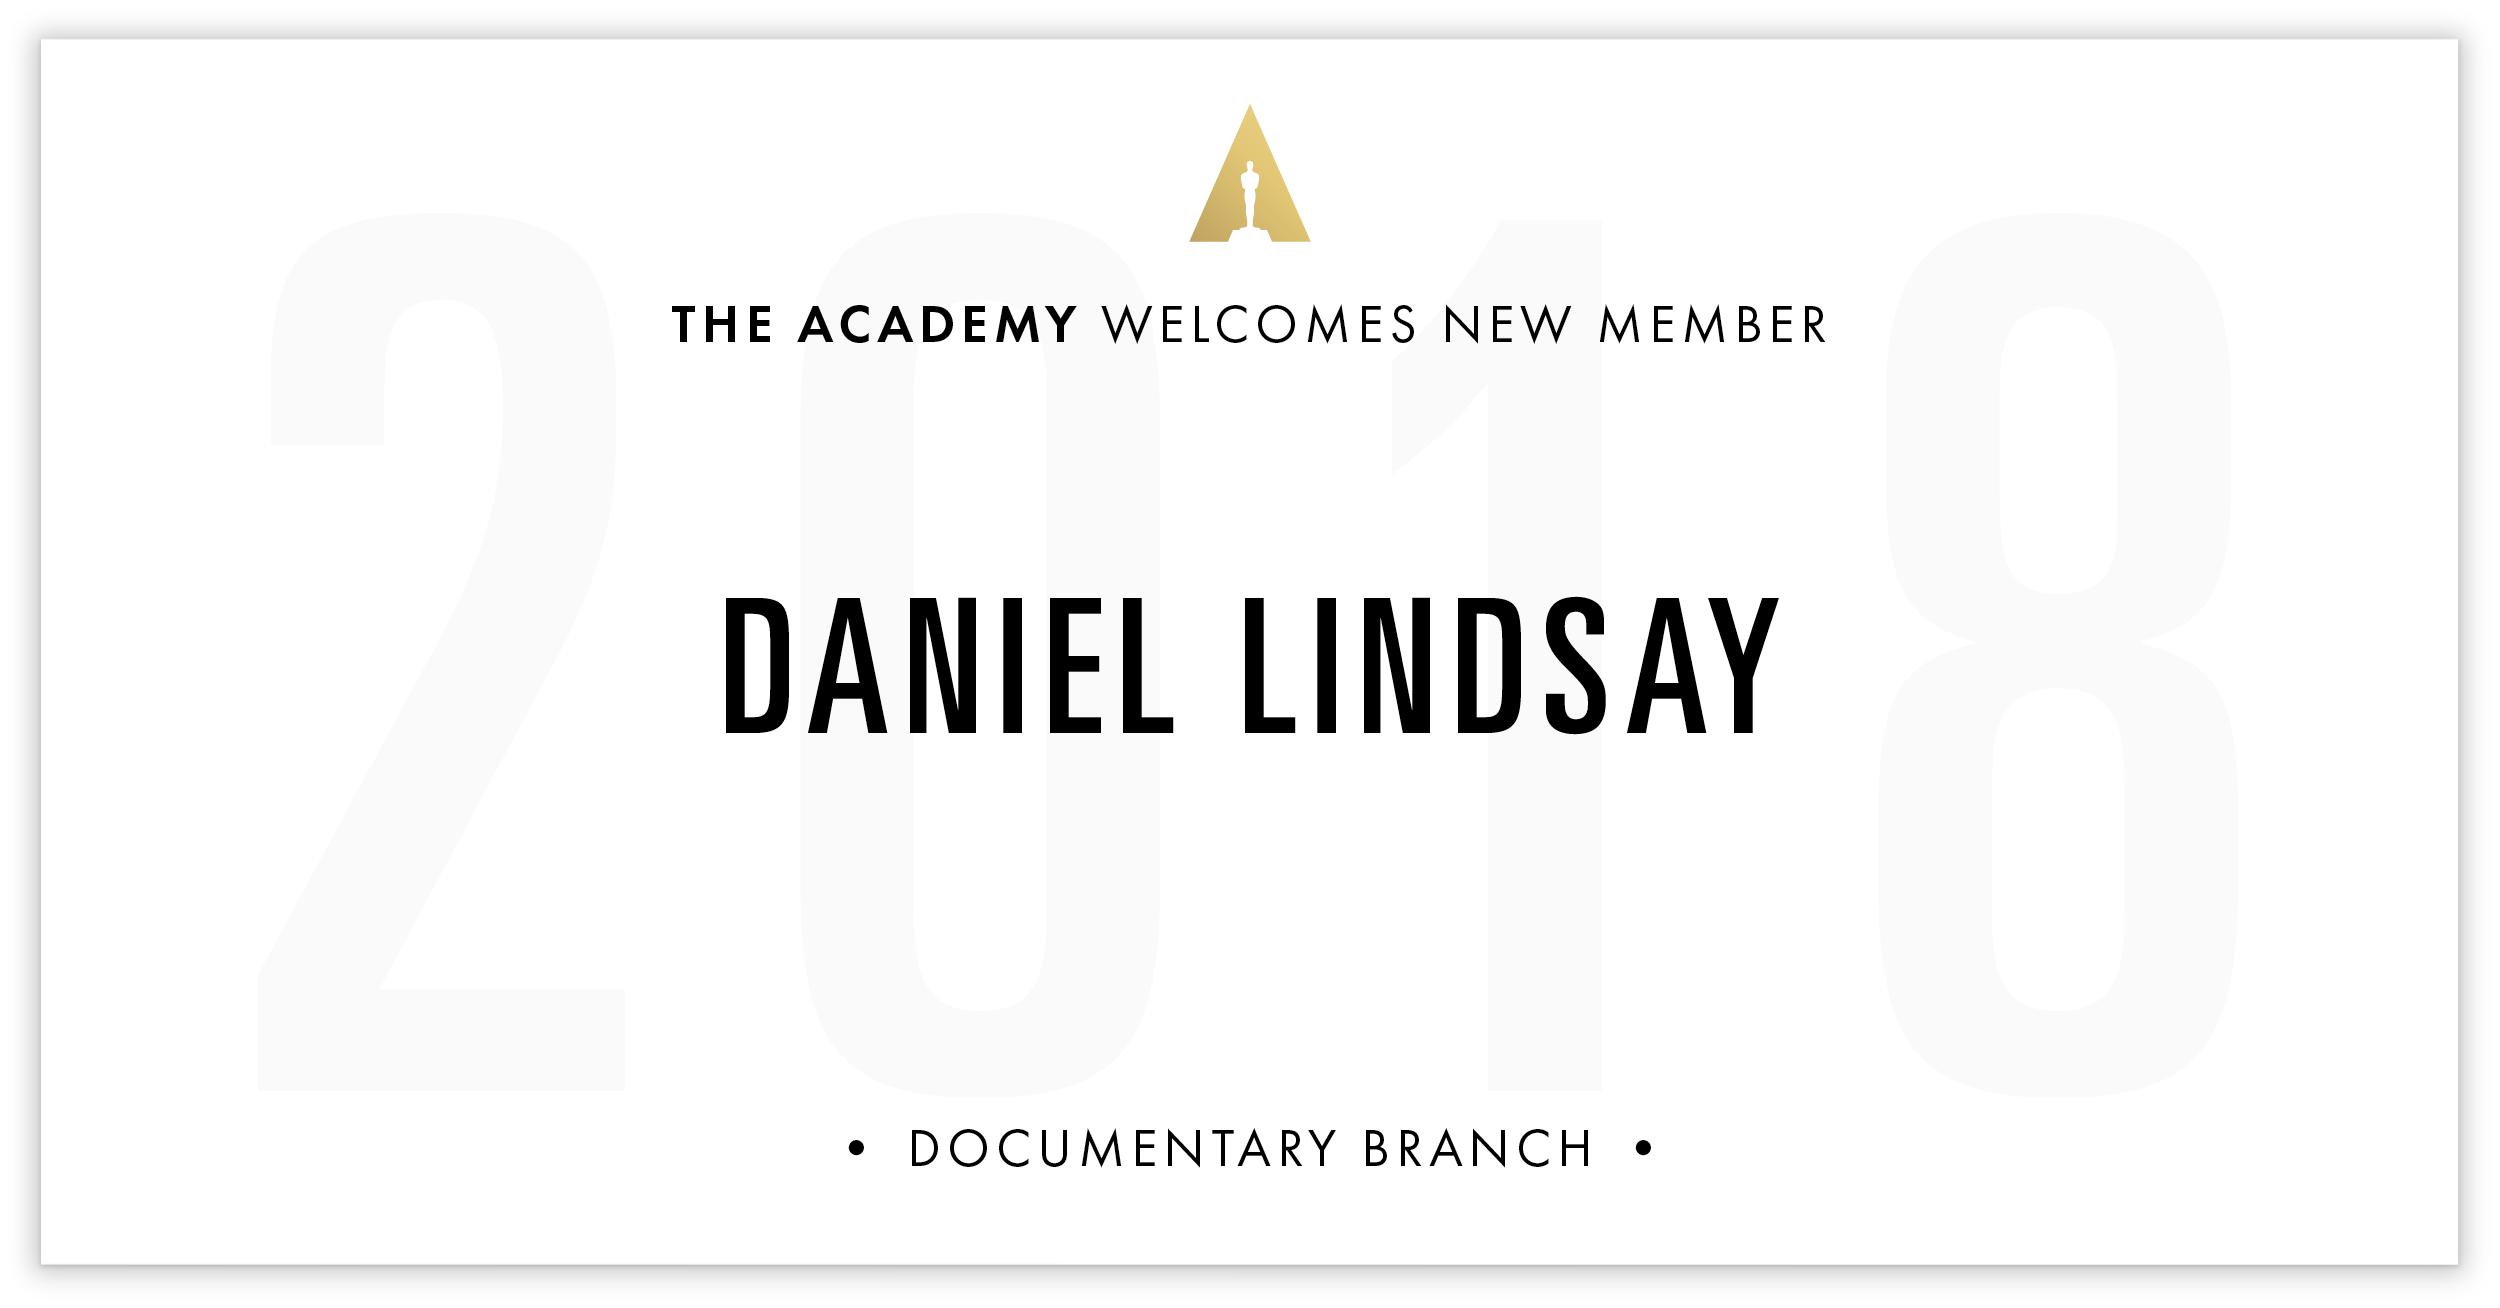 Daniel Lindsay is invited!